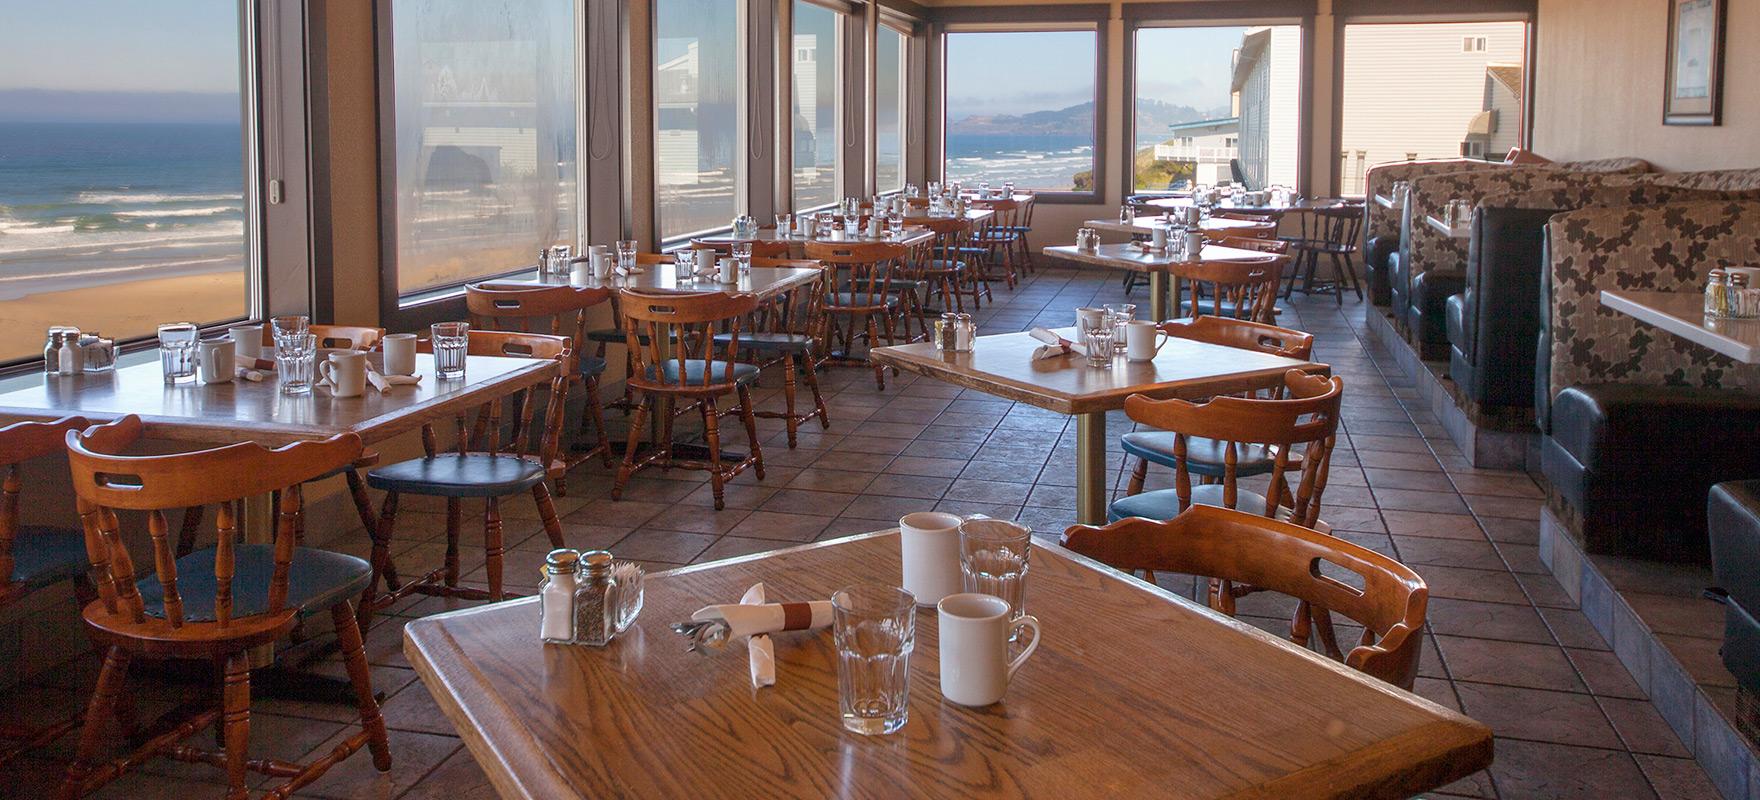 Shilo Inns Suites Hotels Newport Oregon